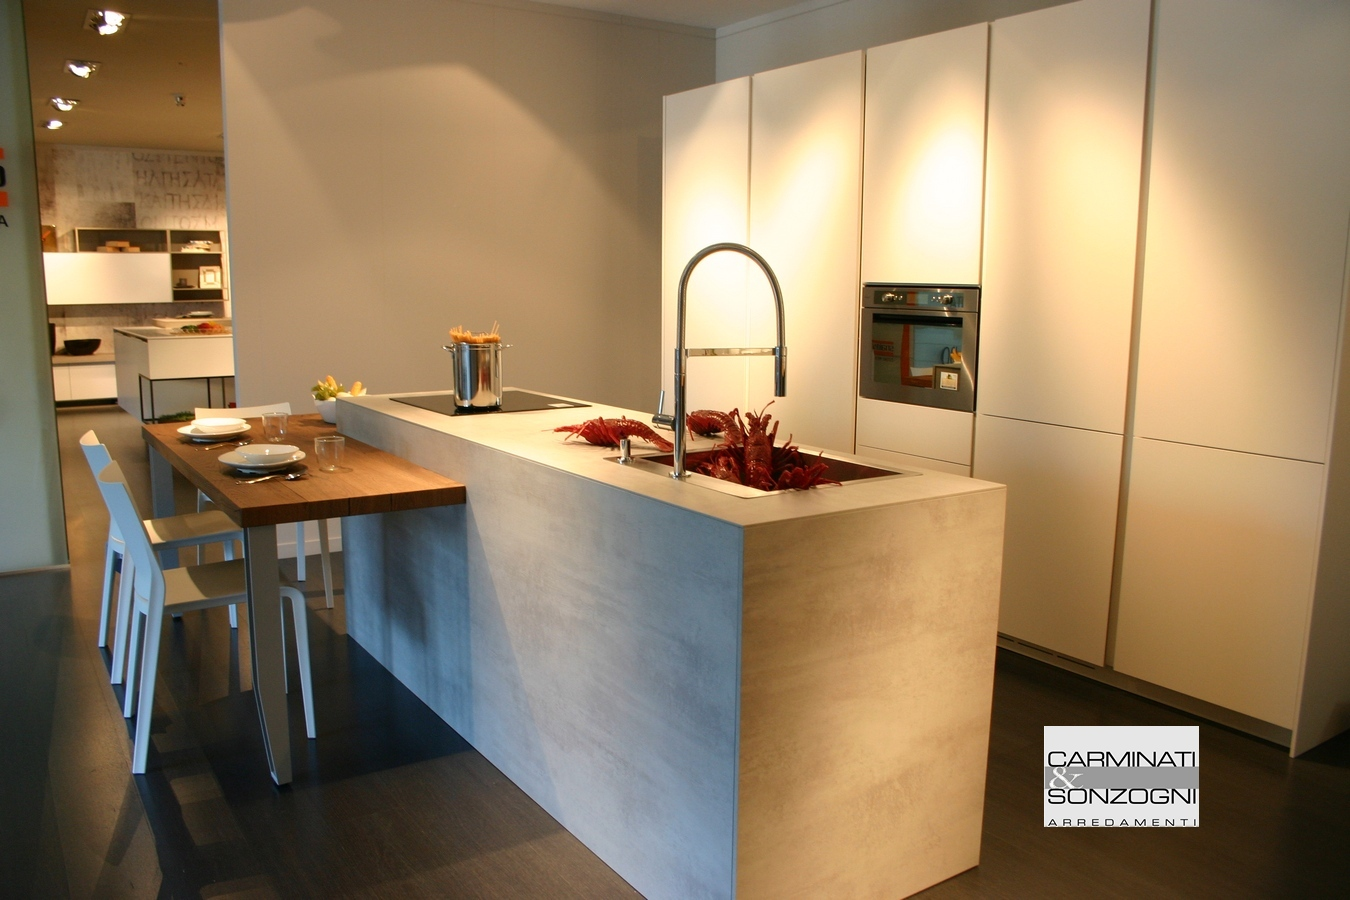 Best Cucina Con Piano Snack Gallery - Ideas & Design 2017 ...